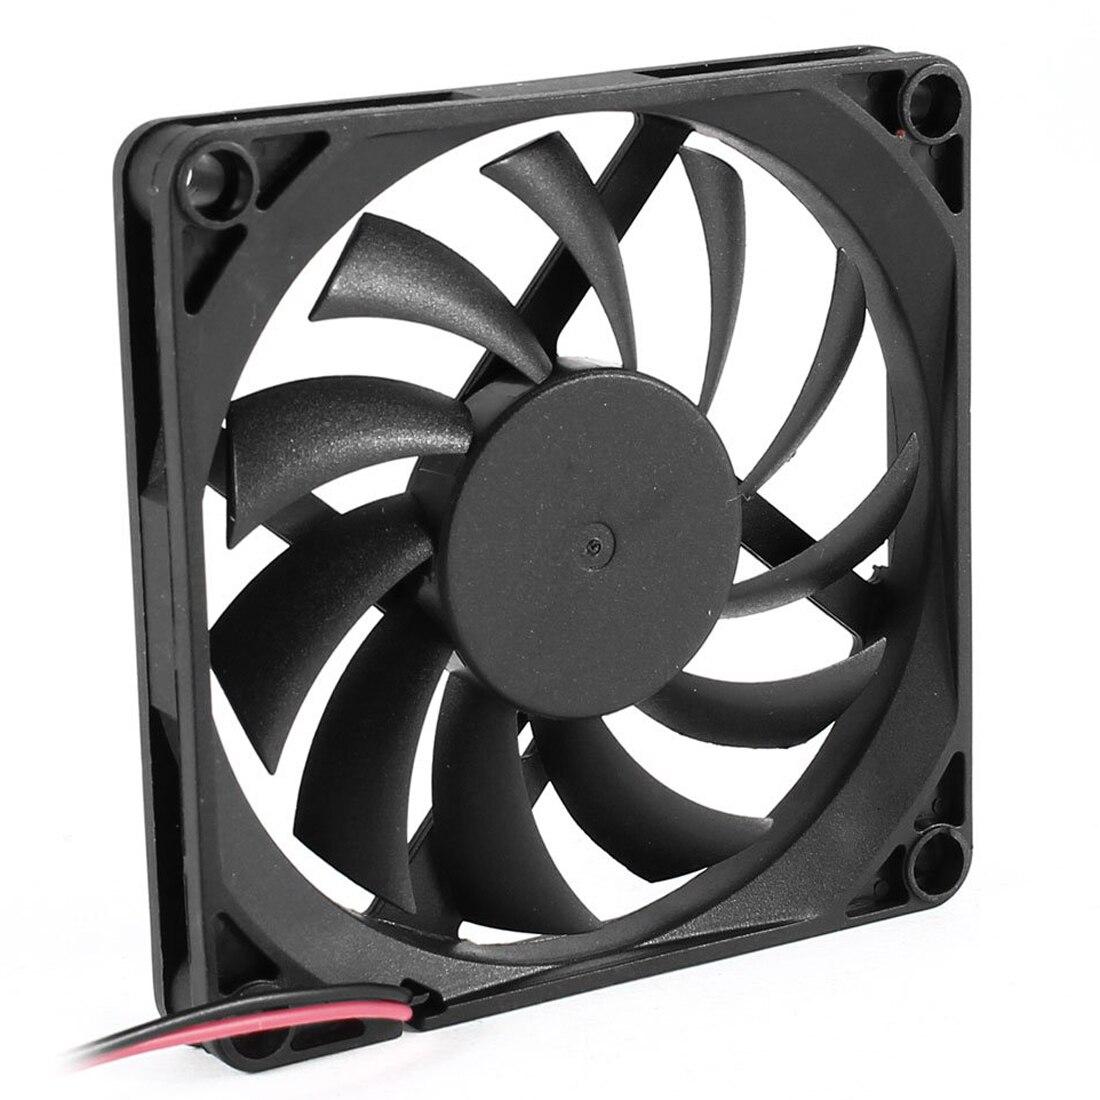 promoCAo-hot-80mm-2-pinos-conector-do-ventilador-de-arrefecimento-para-computador-caso-cpu-cooler-radiador